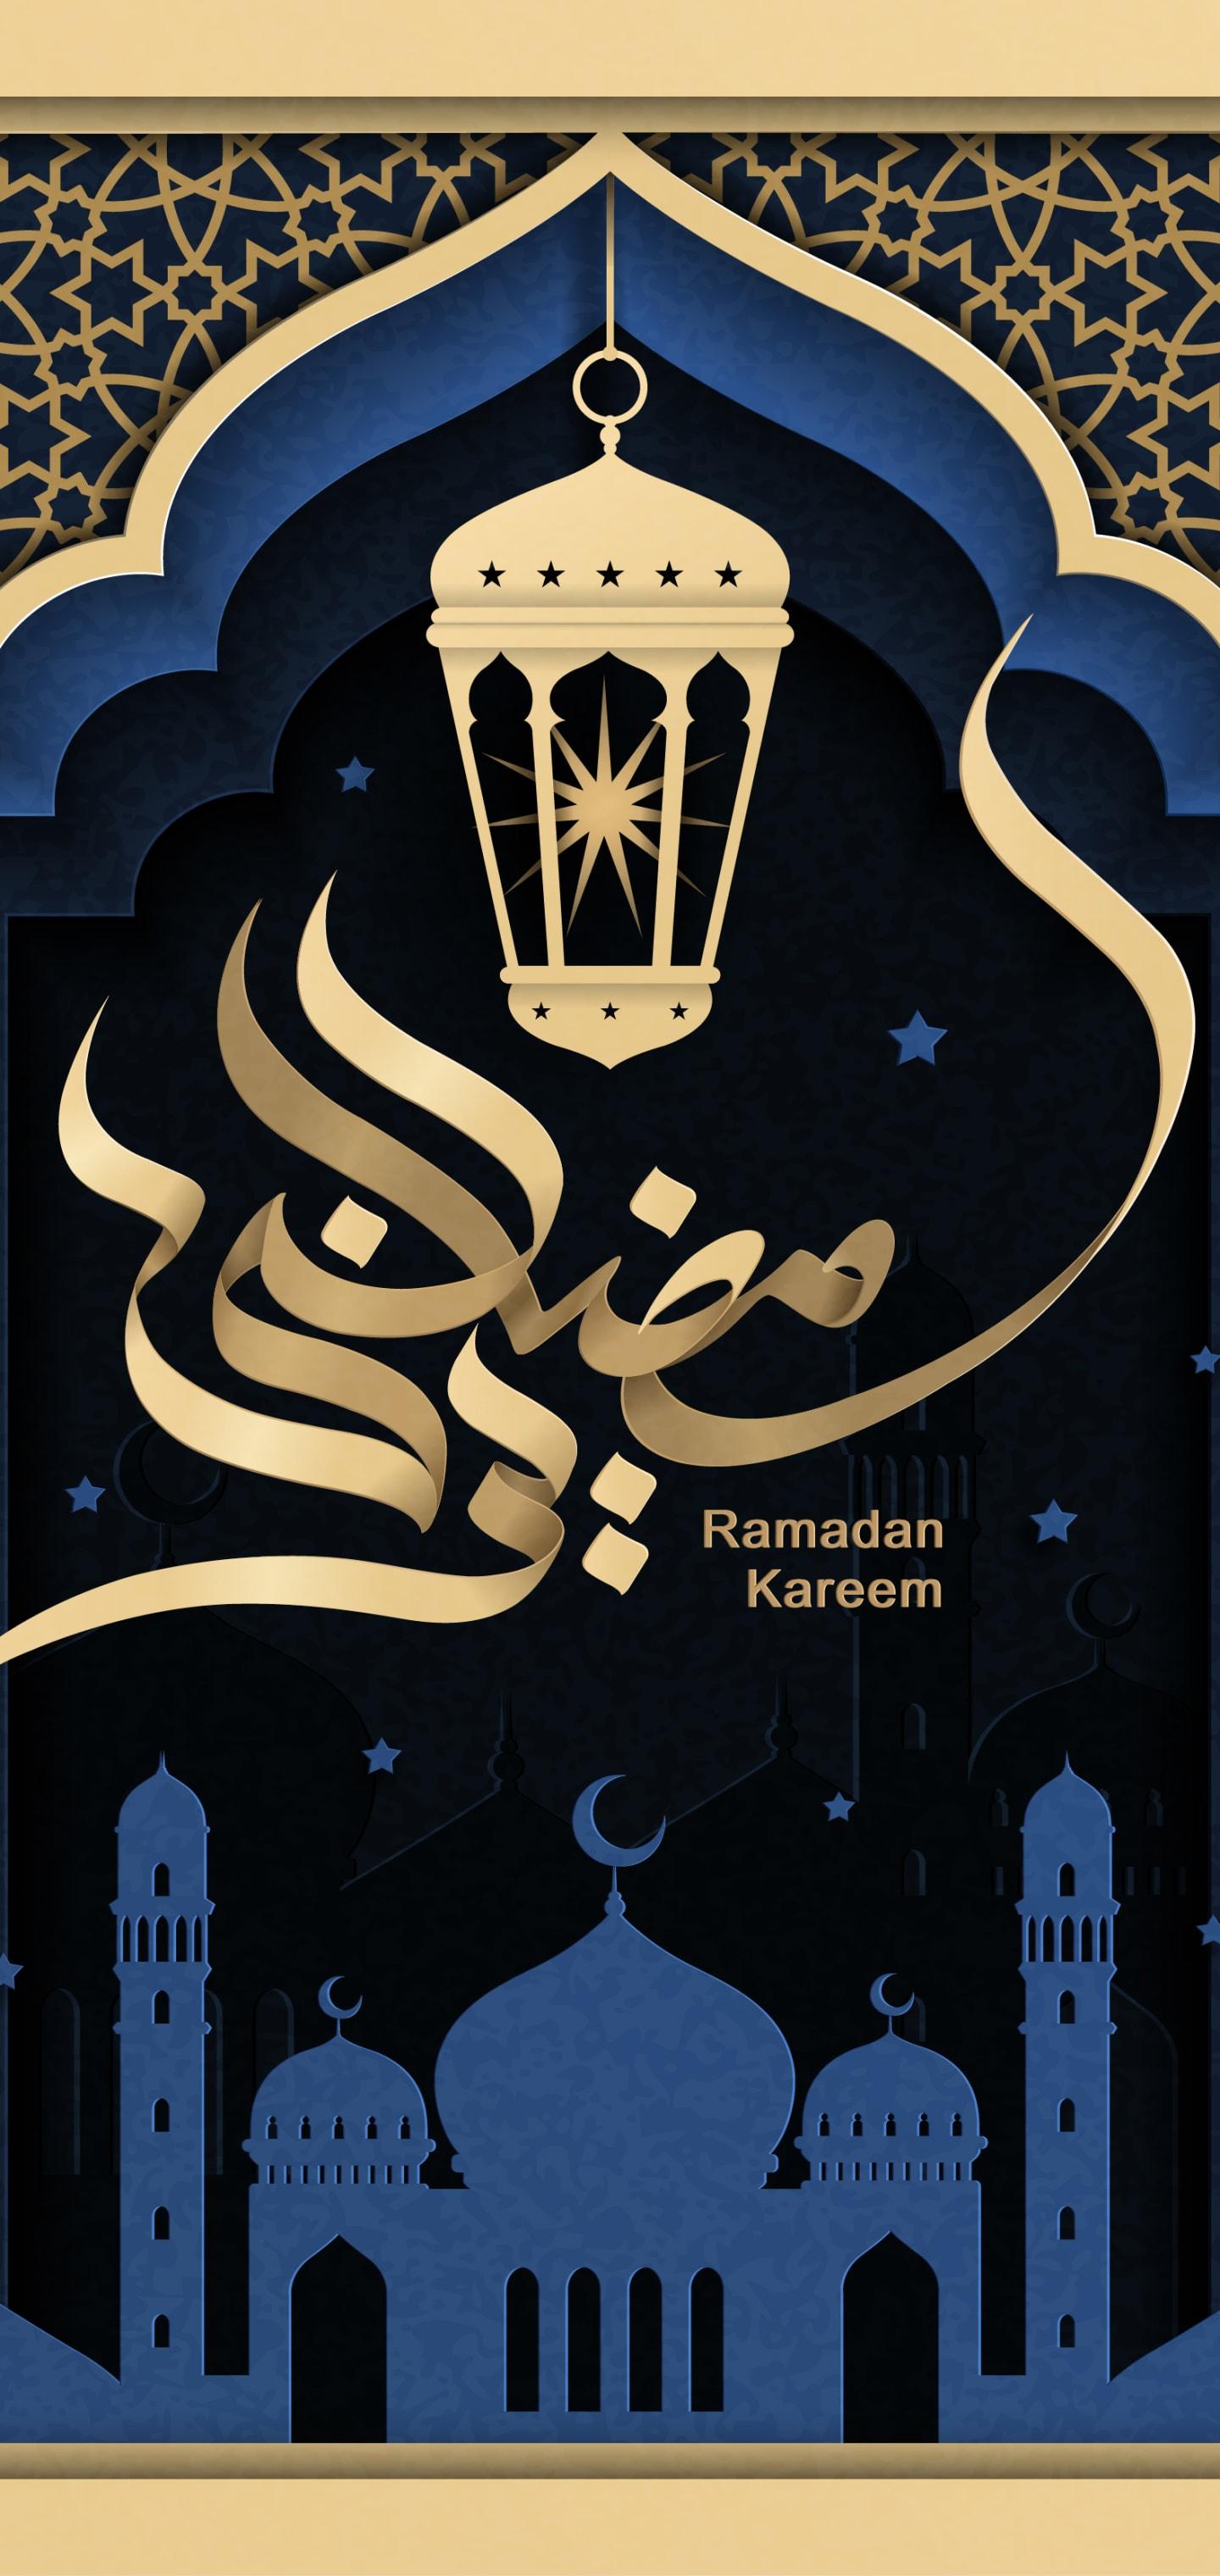 Ramadan Kareem Iphone Wallpaper   KoLPaPer   Awesome HD 1440x3040